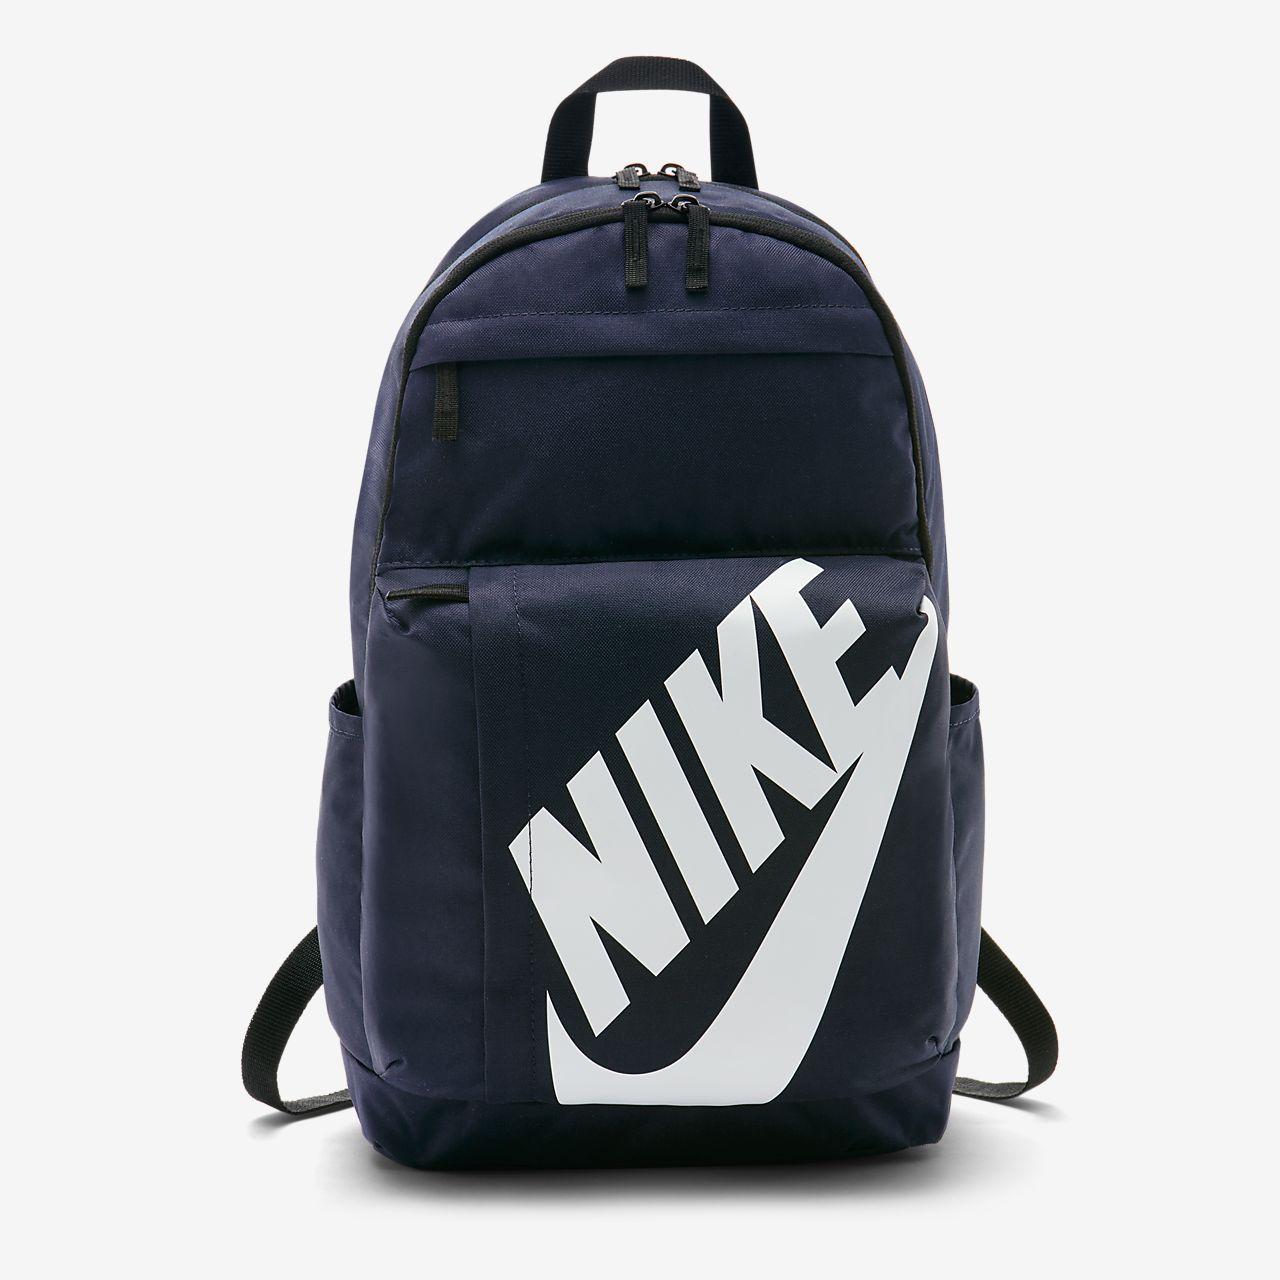 15a6212b4a279 Low Resolution Nike Sportswear Elemental Backpack Nike Sportswear Elemental  Backpack